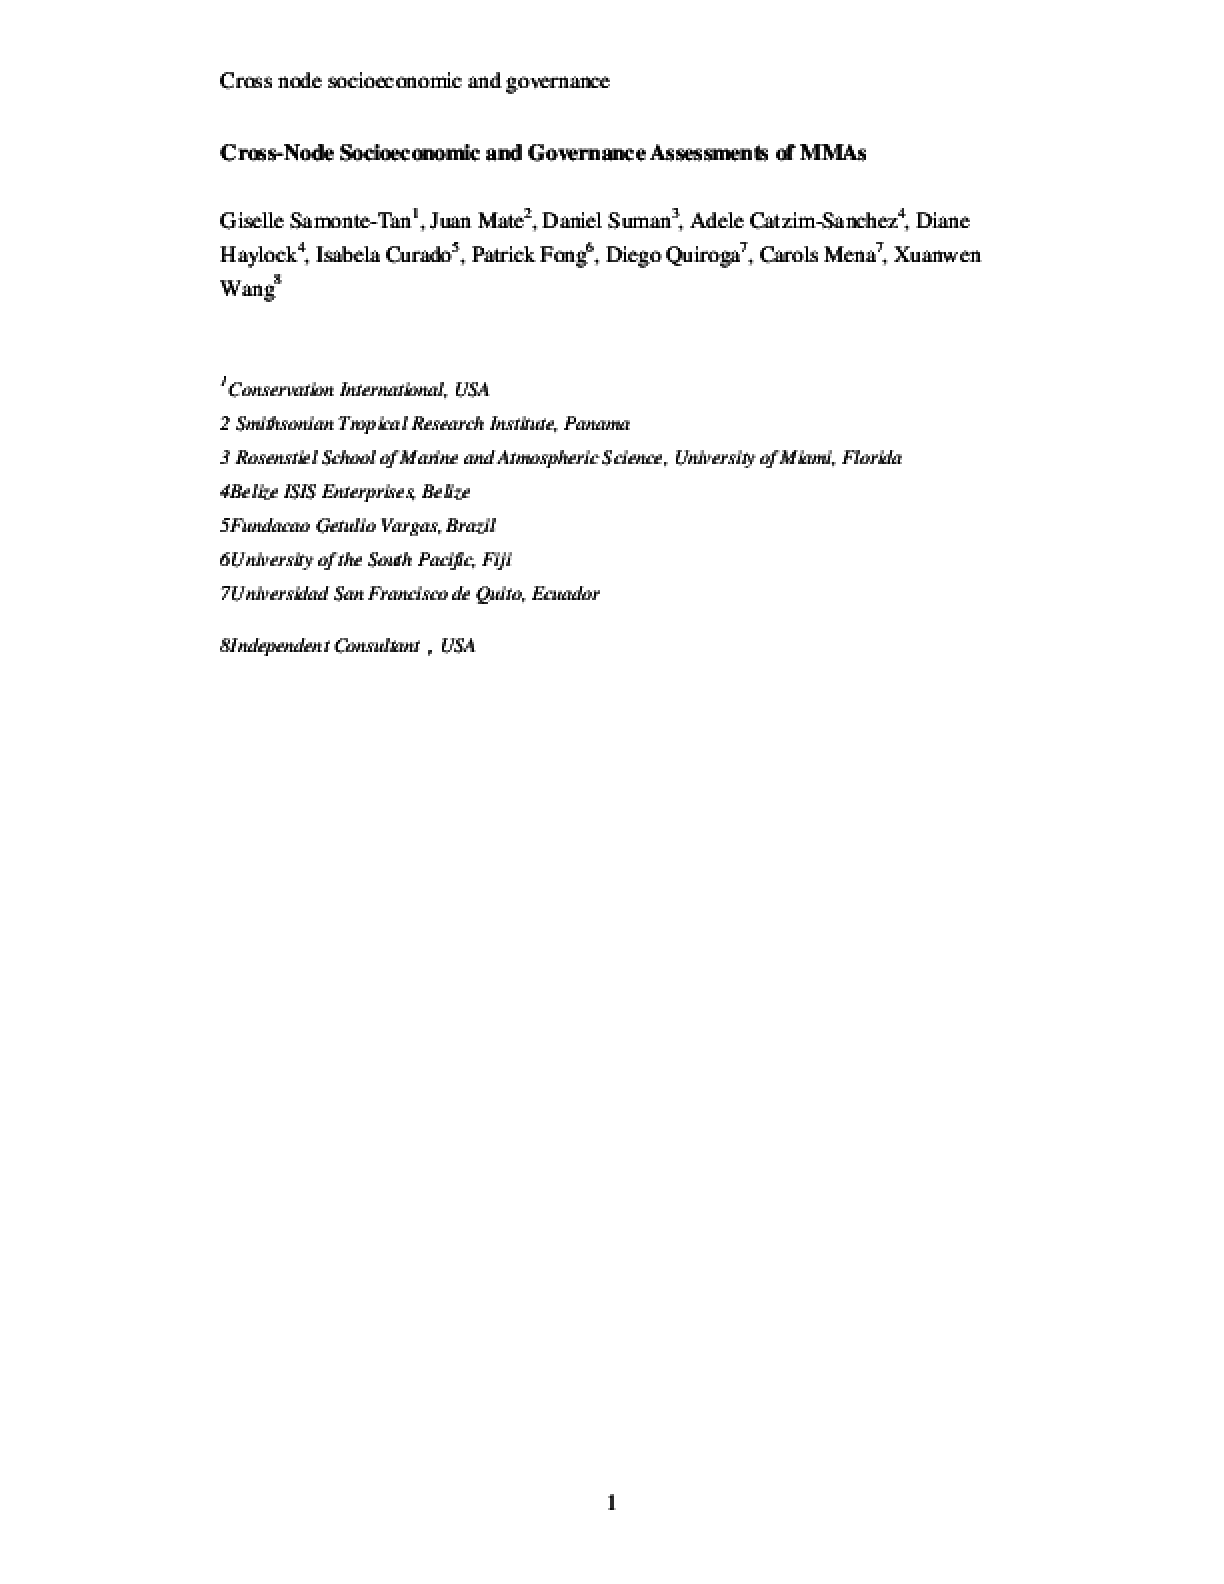 Cross-node Socioeconomic and Governance Assessments of MMAs